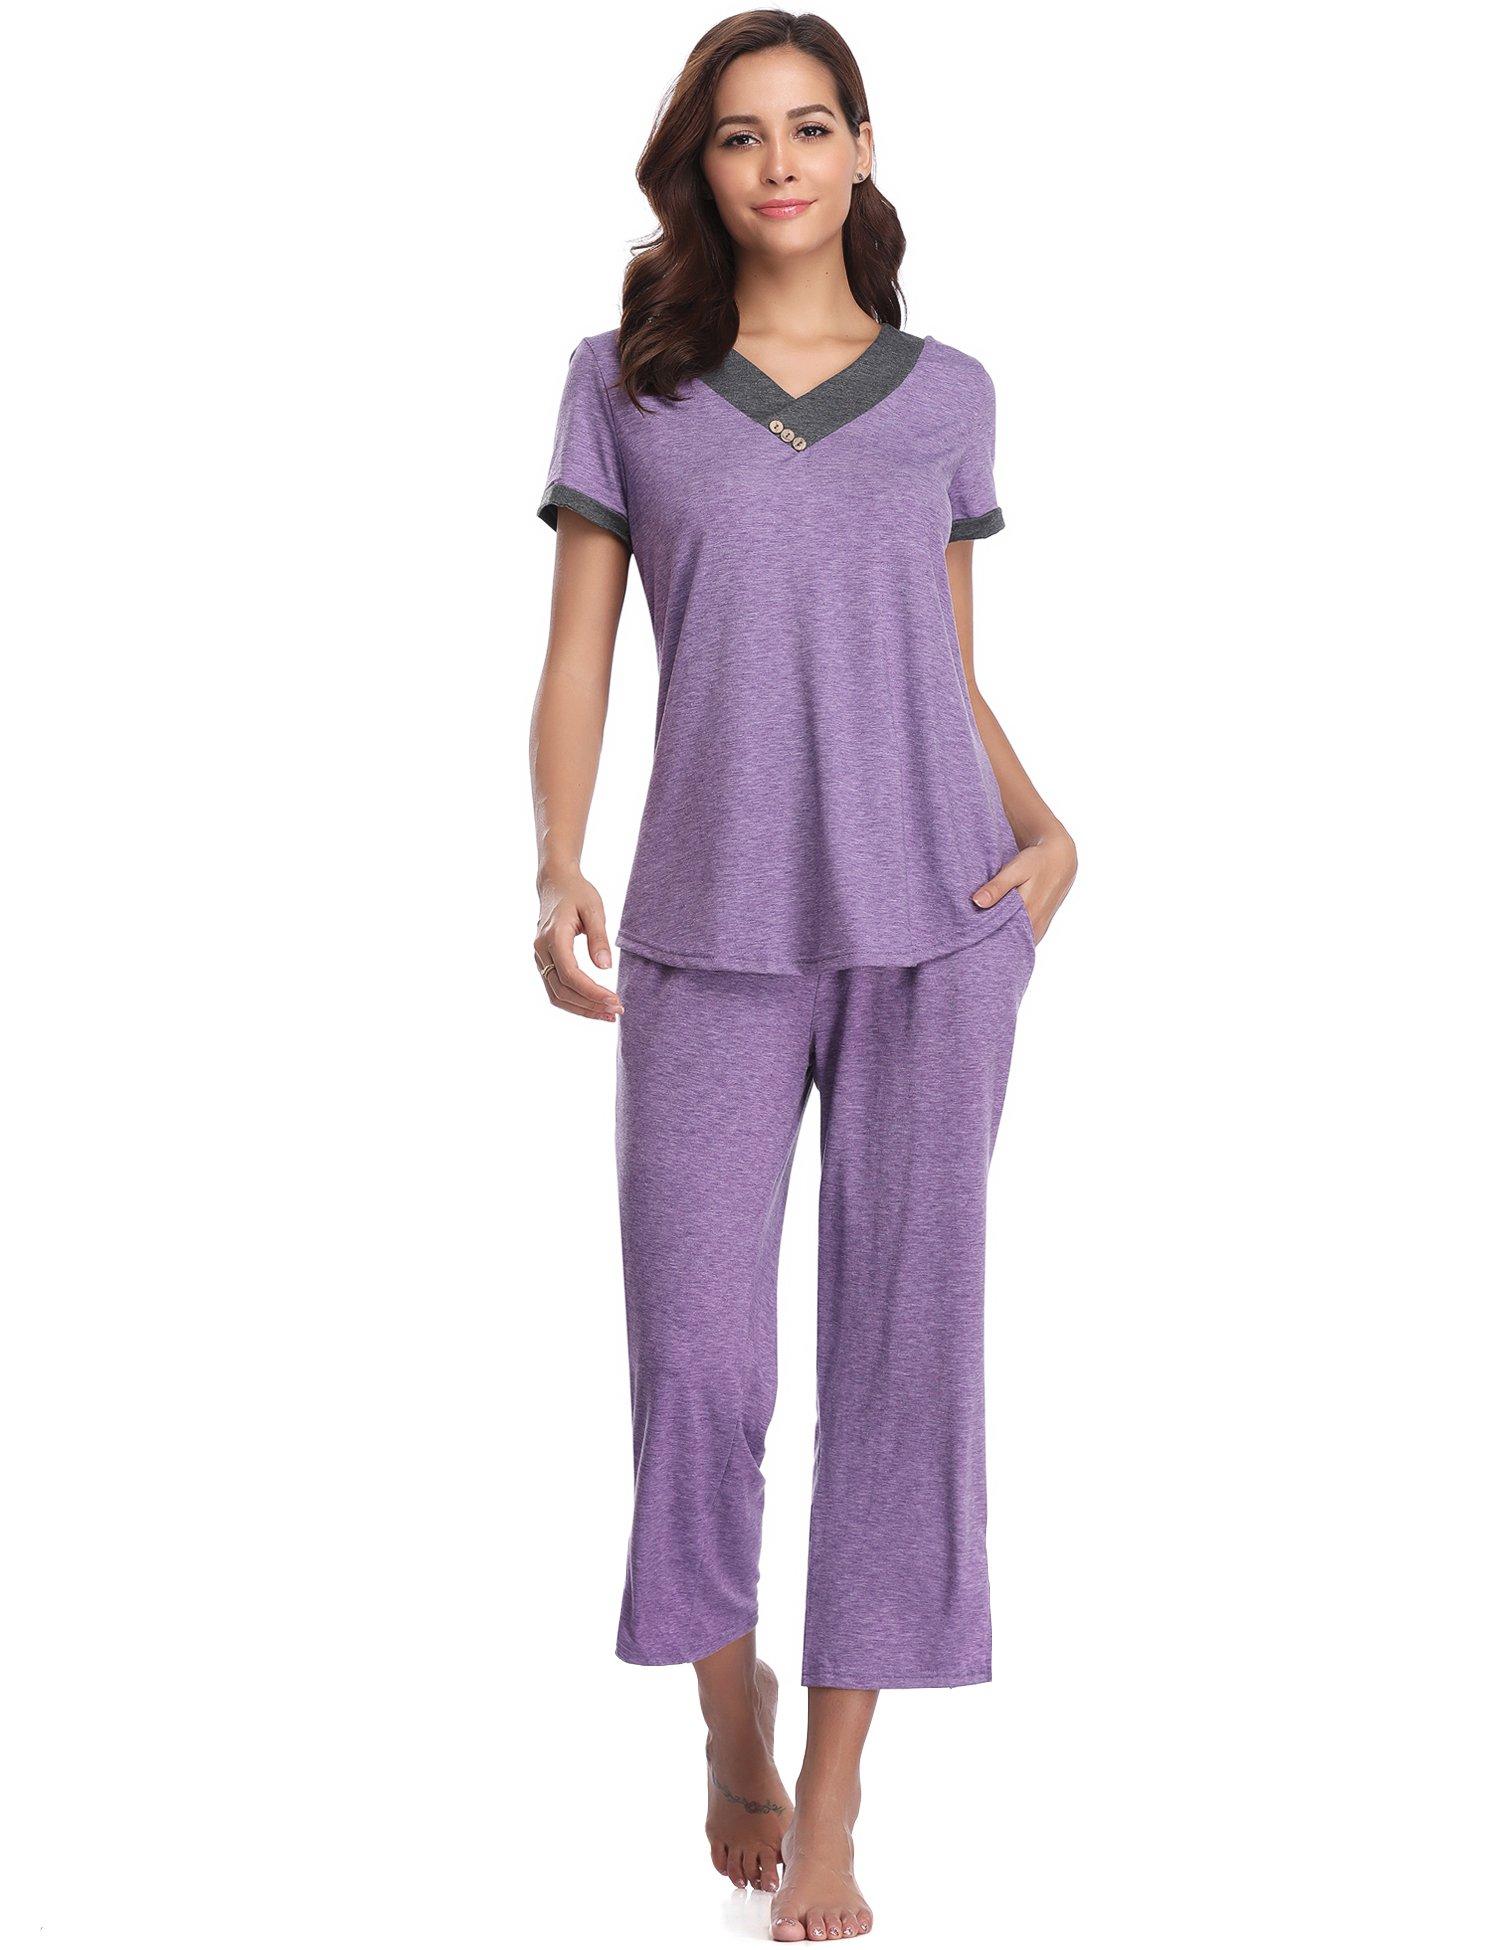 Aibrou Women's Sleepwear Cotton Short Sleeve Pleated Stitching Top and Capri Pant Pajama Set (Light Purple, X-Large)